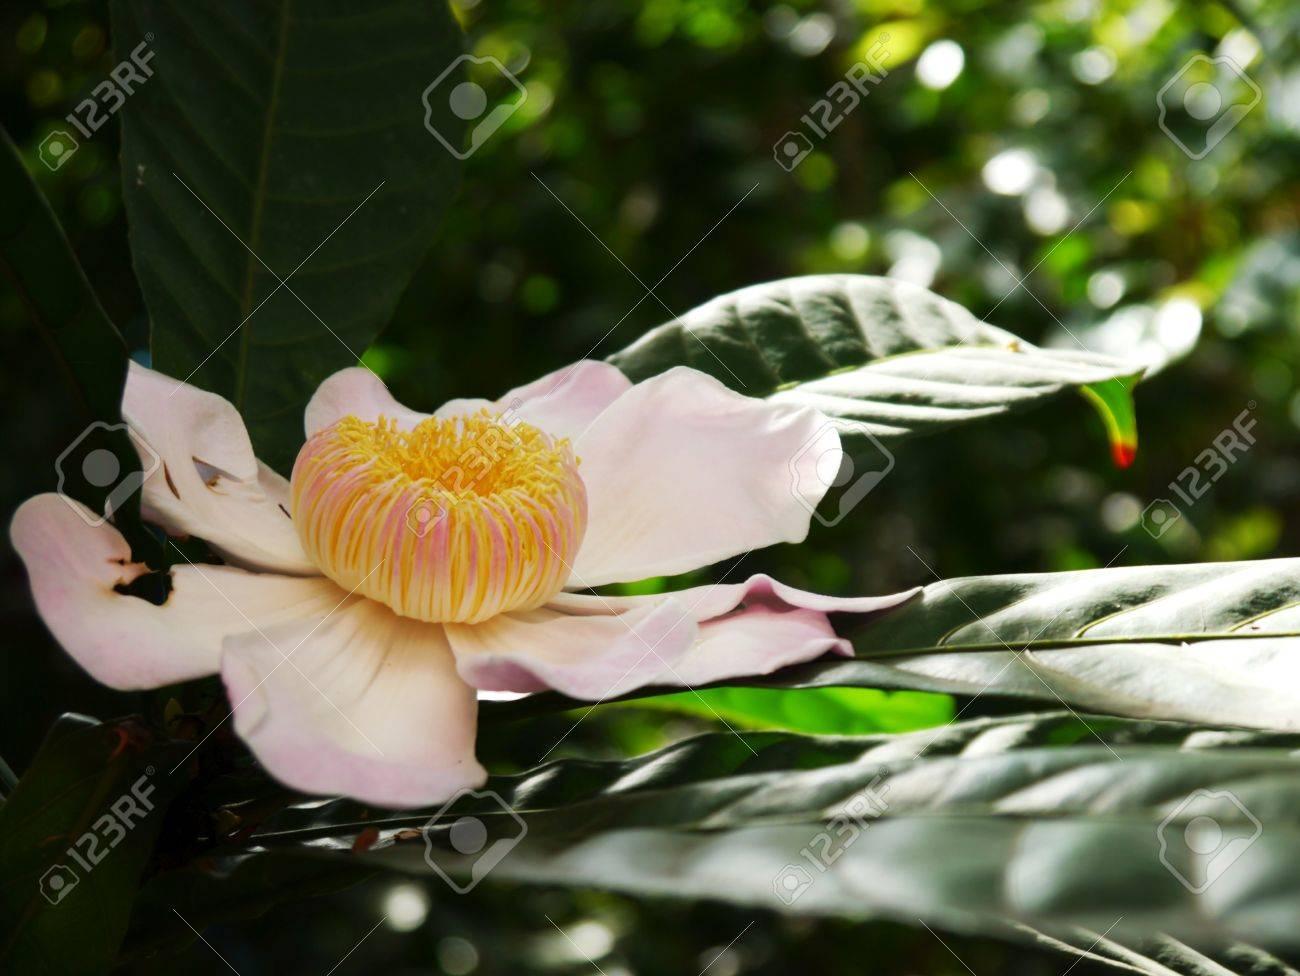 Gustavia like a lotus flower stock photo picture and royalty free gustavia like a lotus flower stock photo 64660807 izmirmasajfo Images